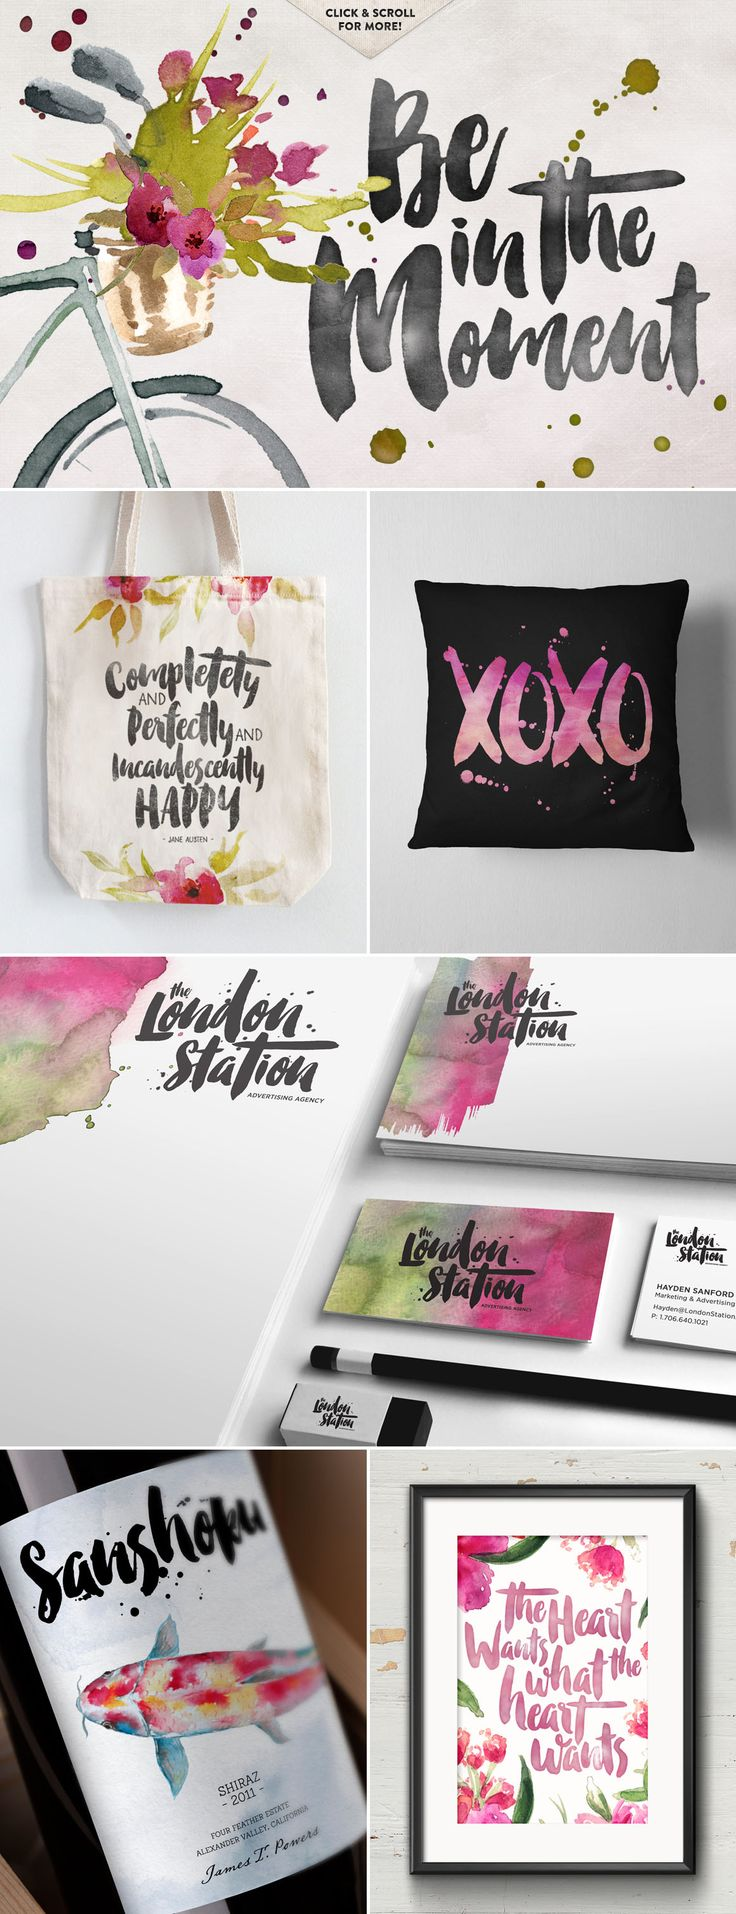 9 best press pass template images on pinterest print. Black Bedroom Furniture Sets. Home Design Ideas